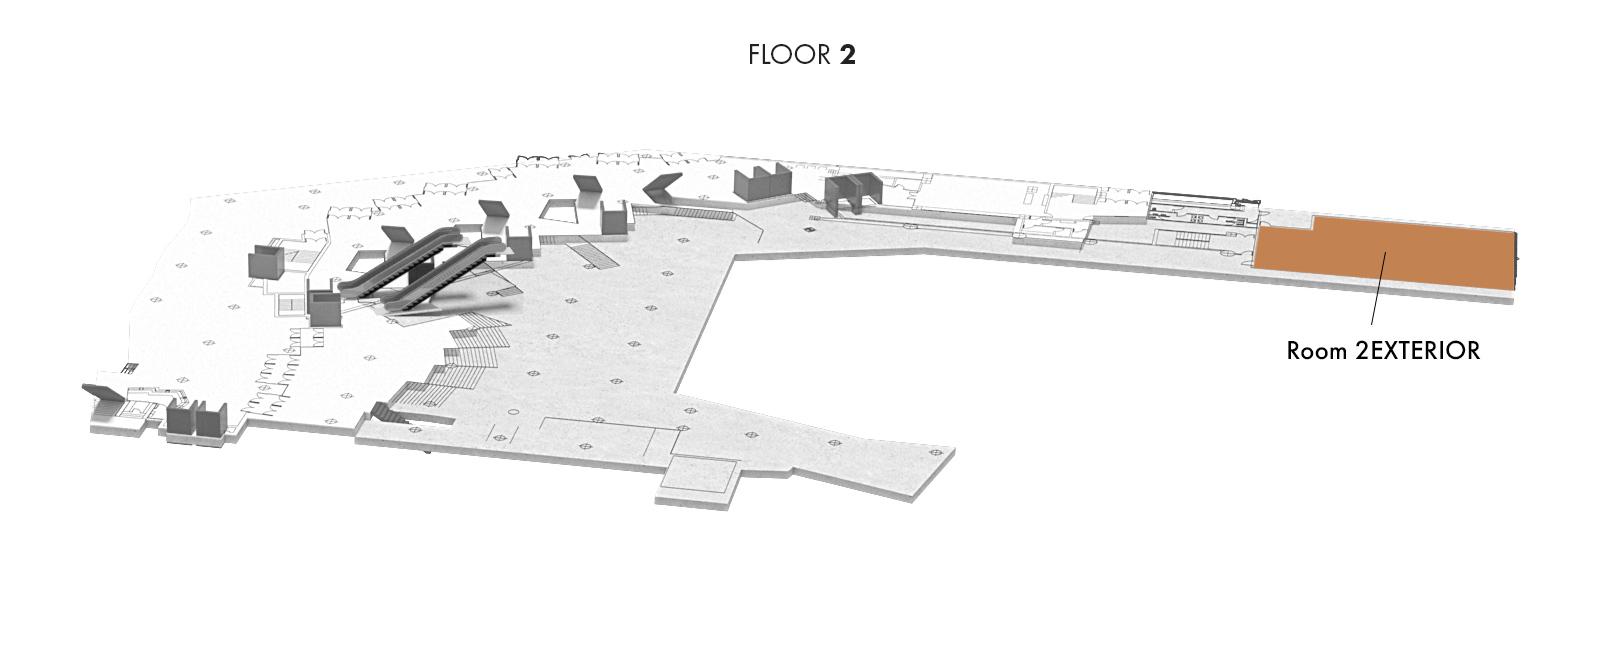 Room 2EXTERIOR, Floor 2 | Palacio Euskalduna Jauregia